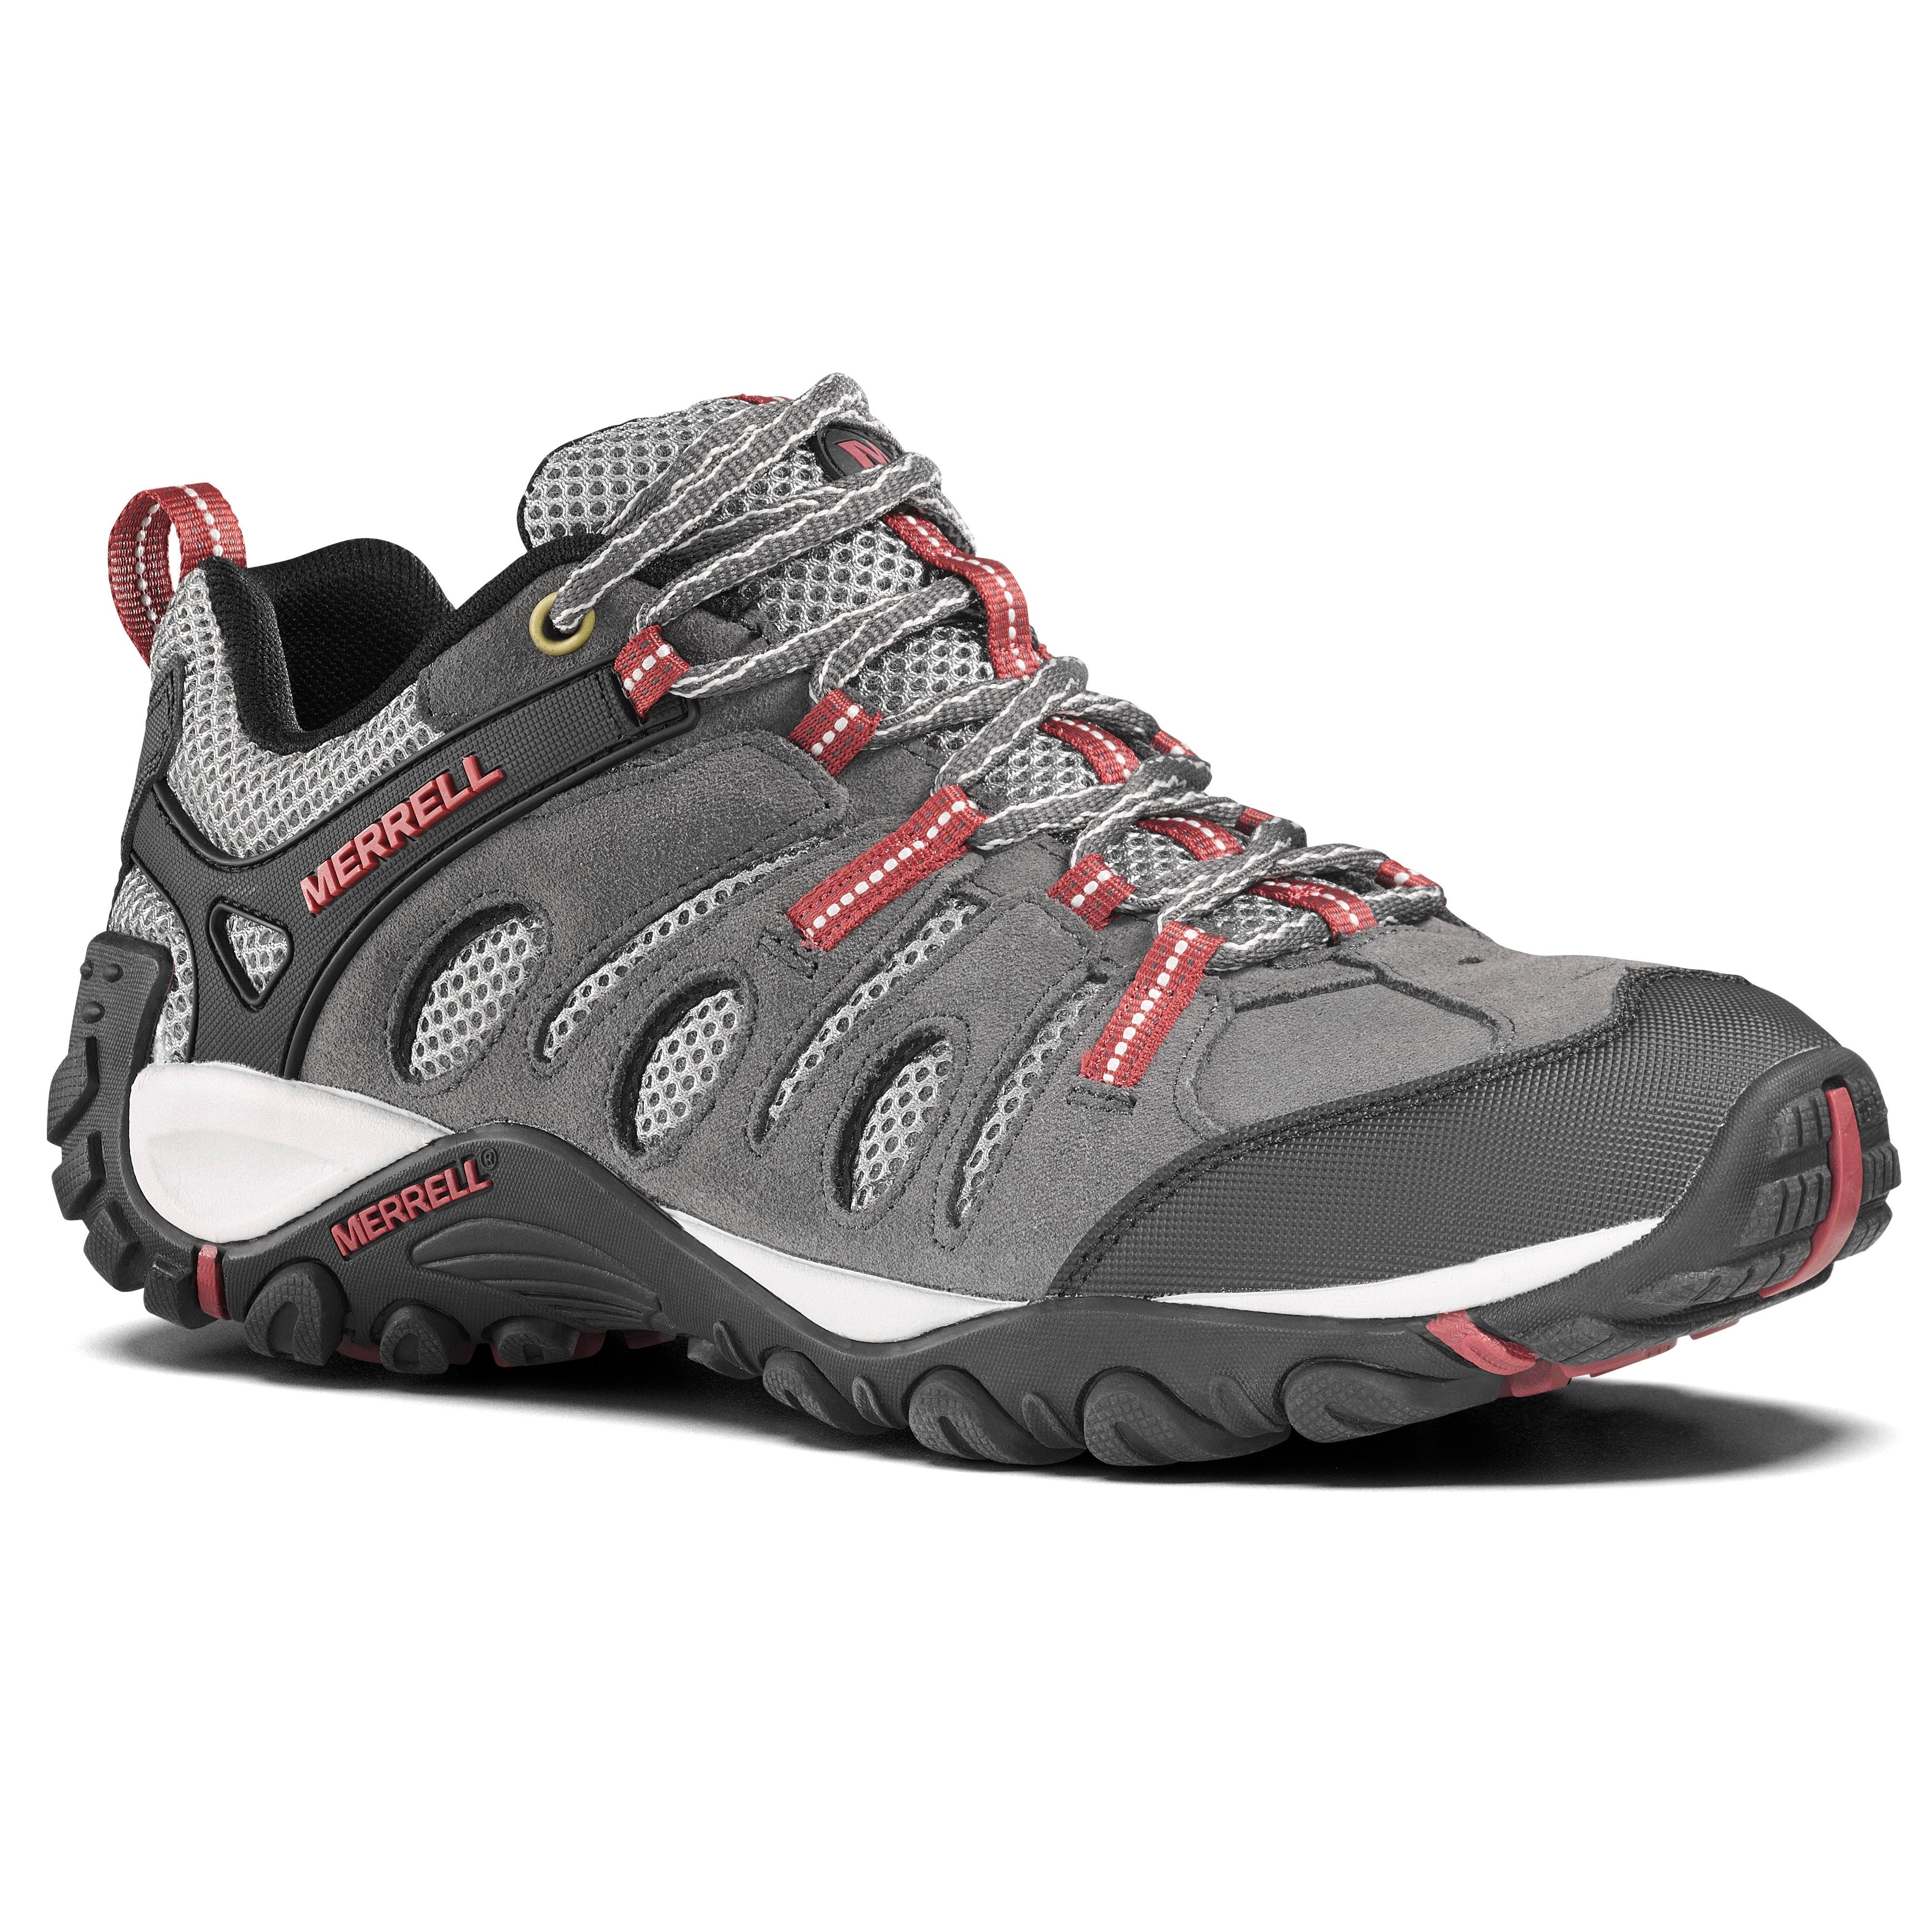 taille 40 e87e9 03223 Chaussures   Randonnée - Trek   Decathlon